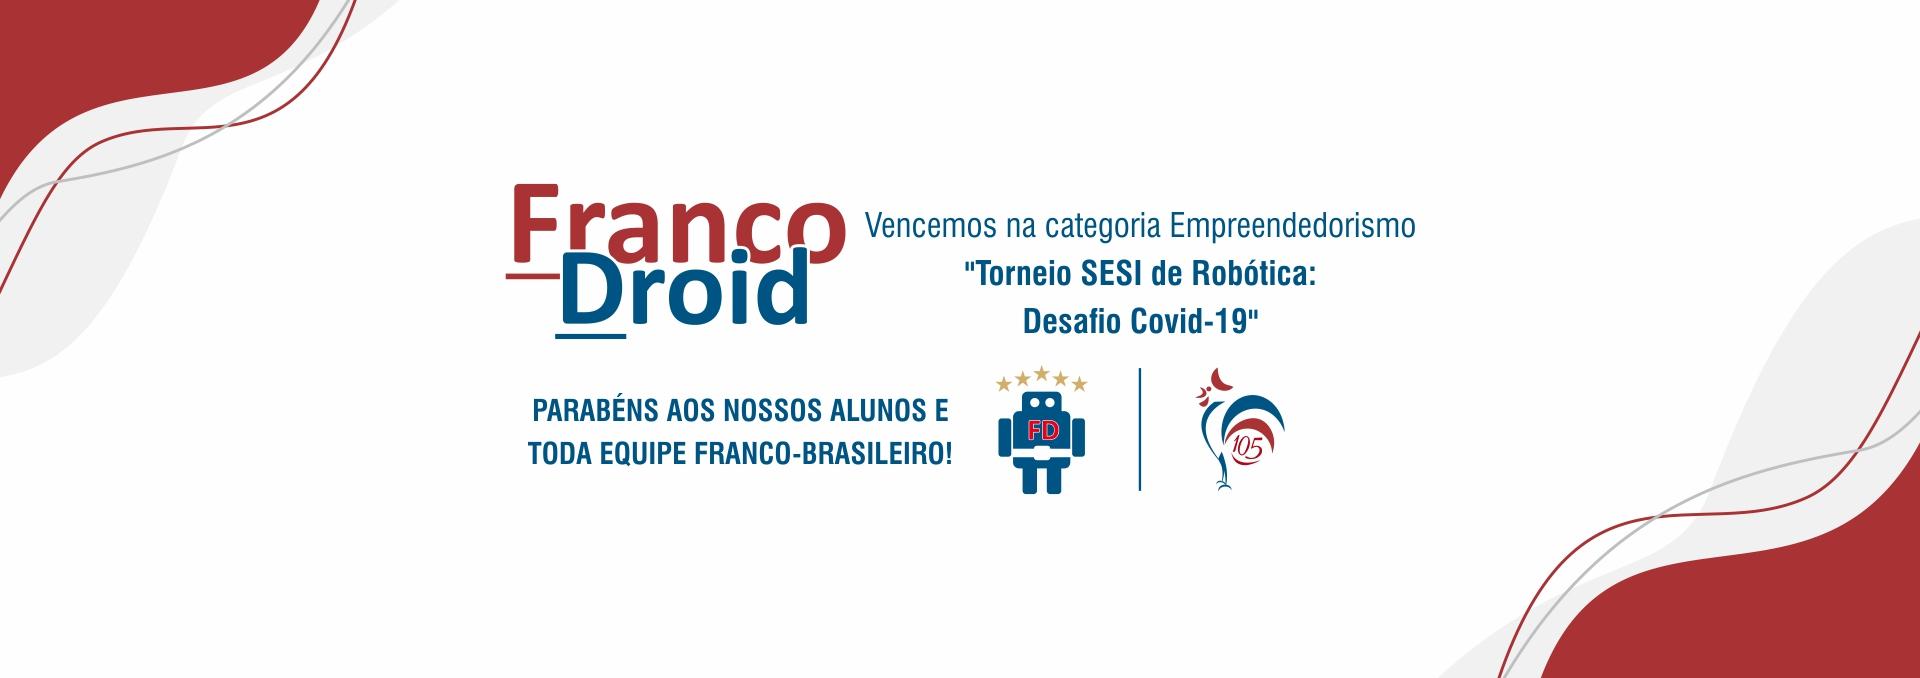 "FrancoDroid vence na categoria ""Empreendedorismo"" – Torneio SESI de Robótica: Desafio Covid-19"